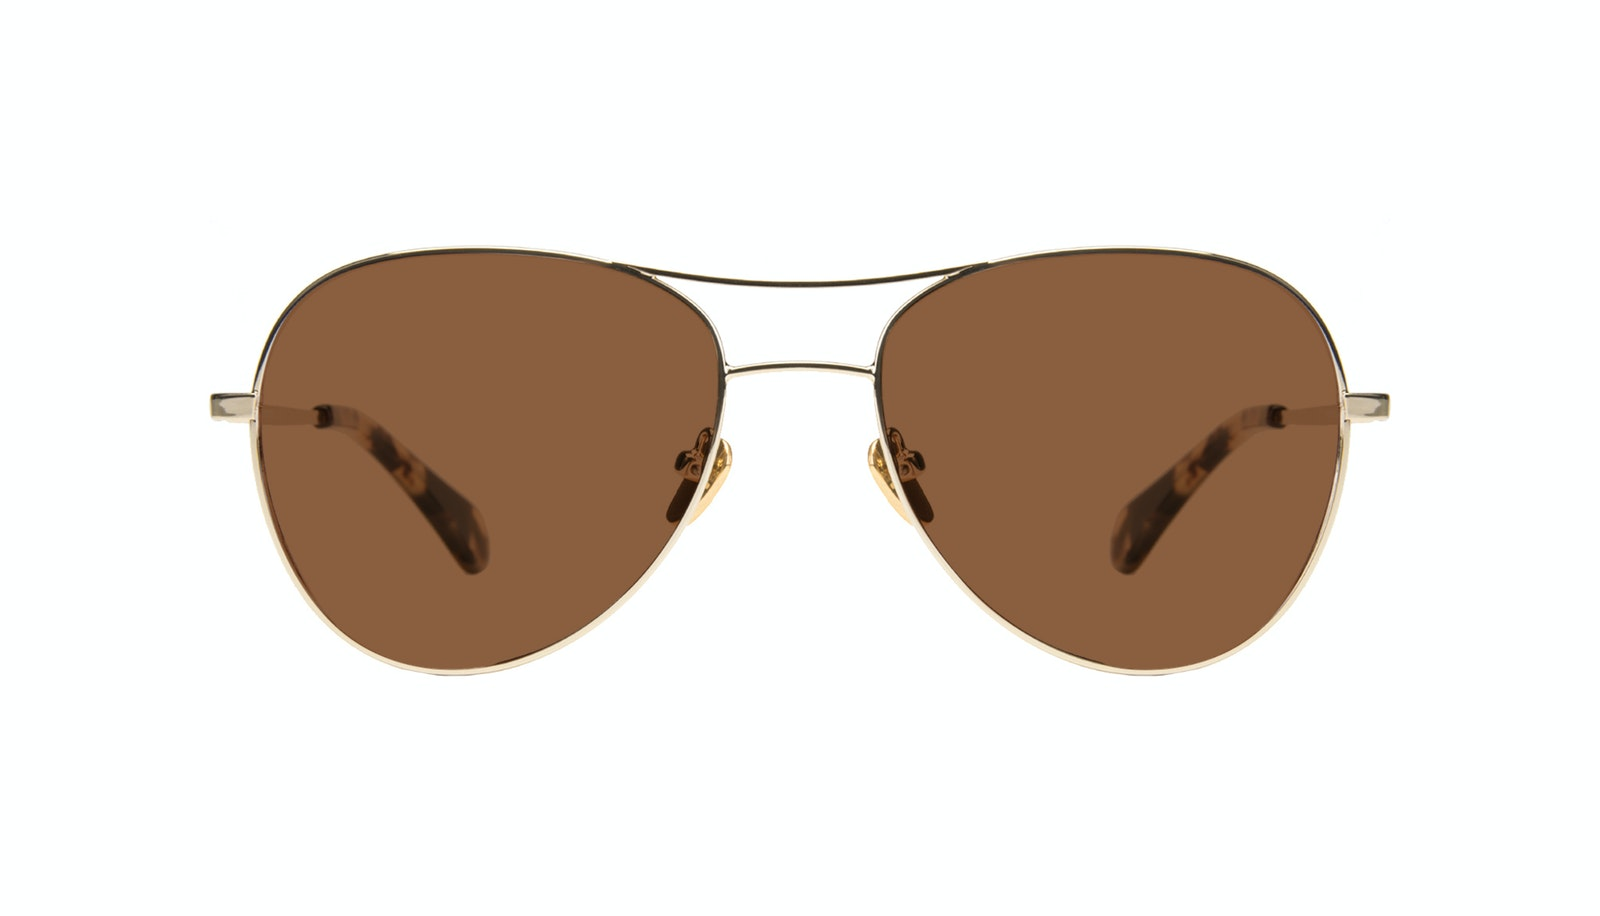 Affordable Fashion Glasses Aviator Sunglasses Women Want Gold